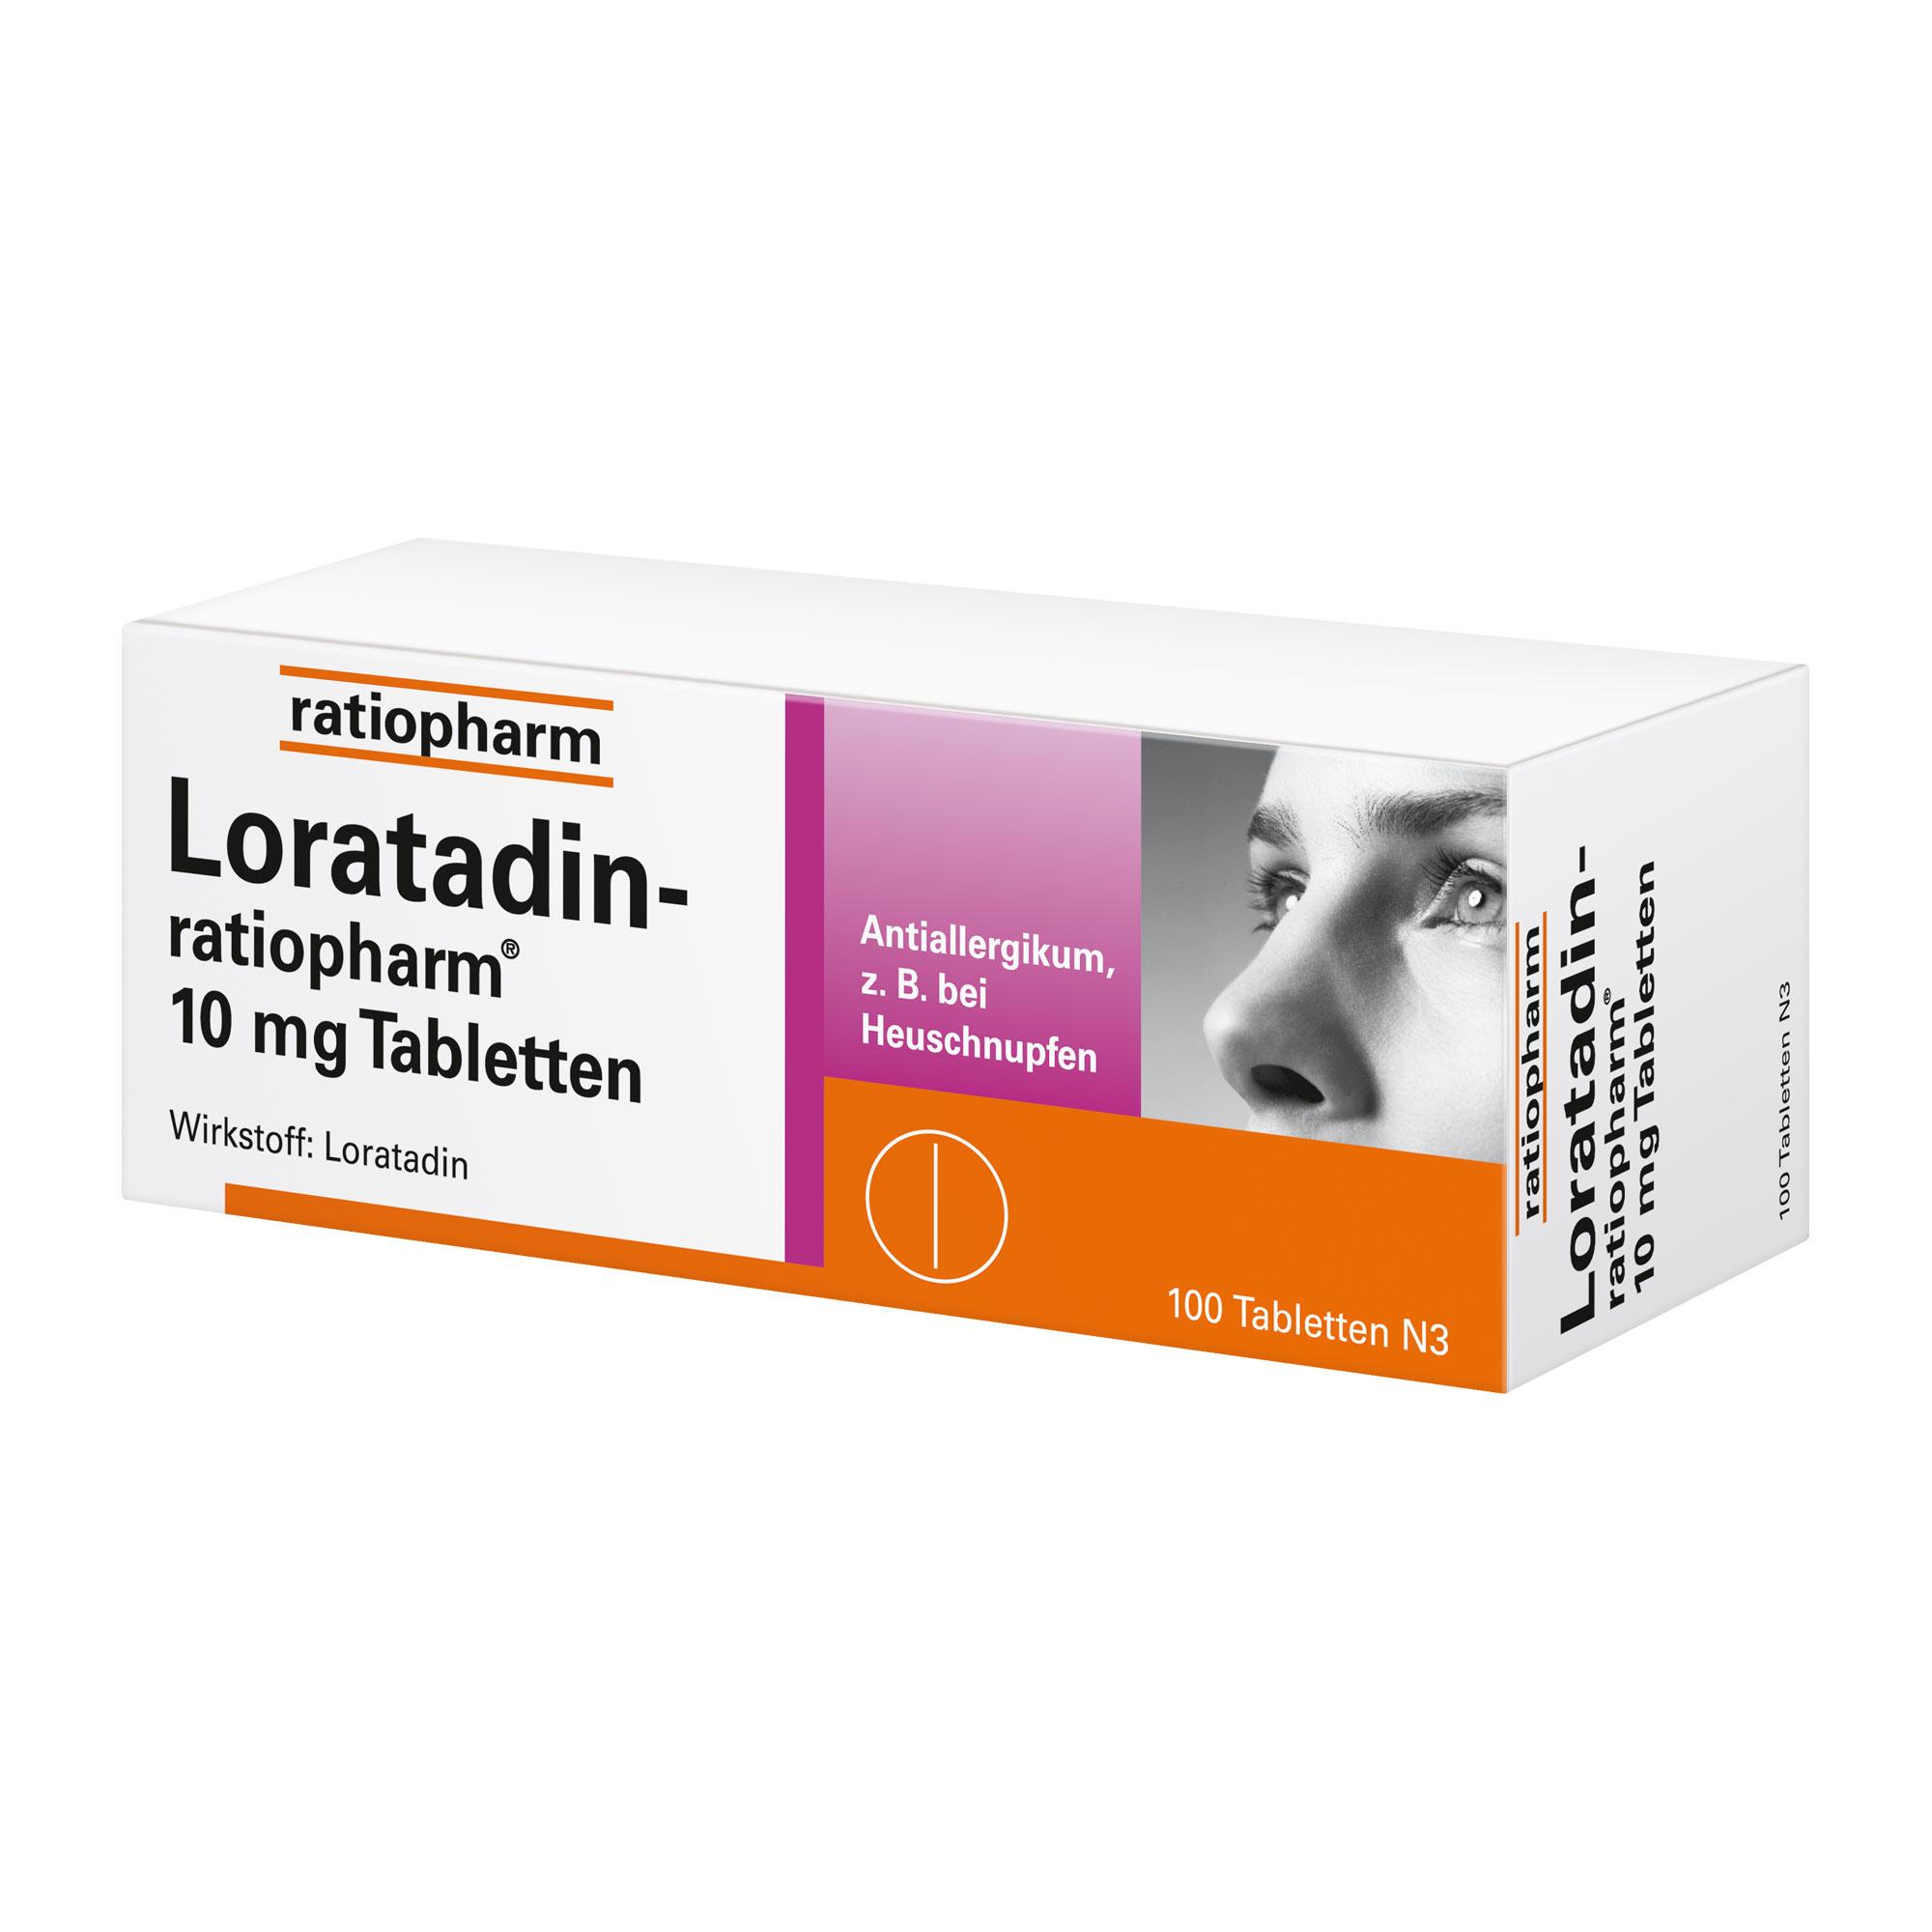 Loratadin-ratiopharm 10 mg